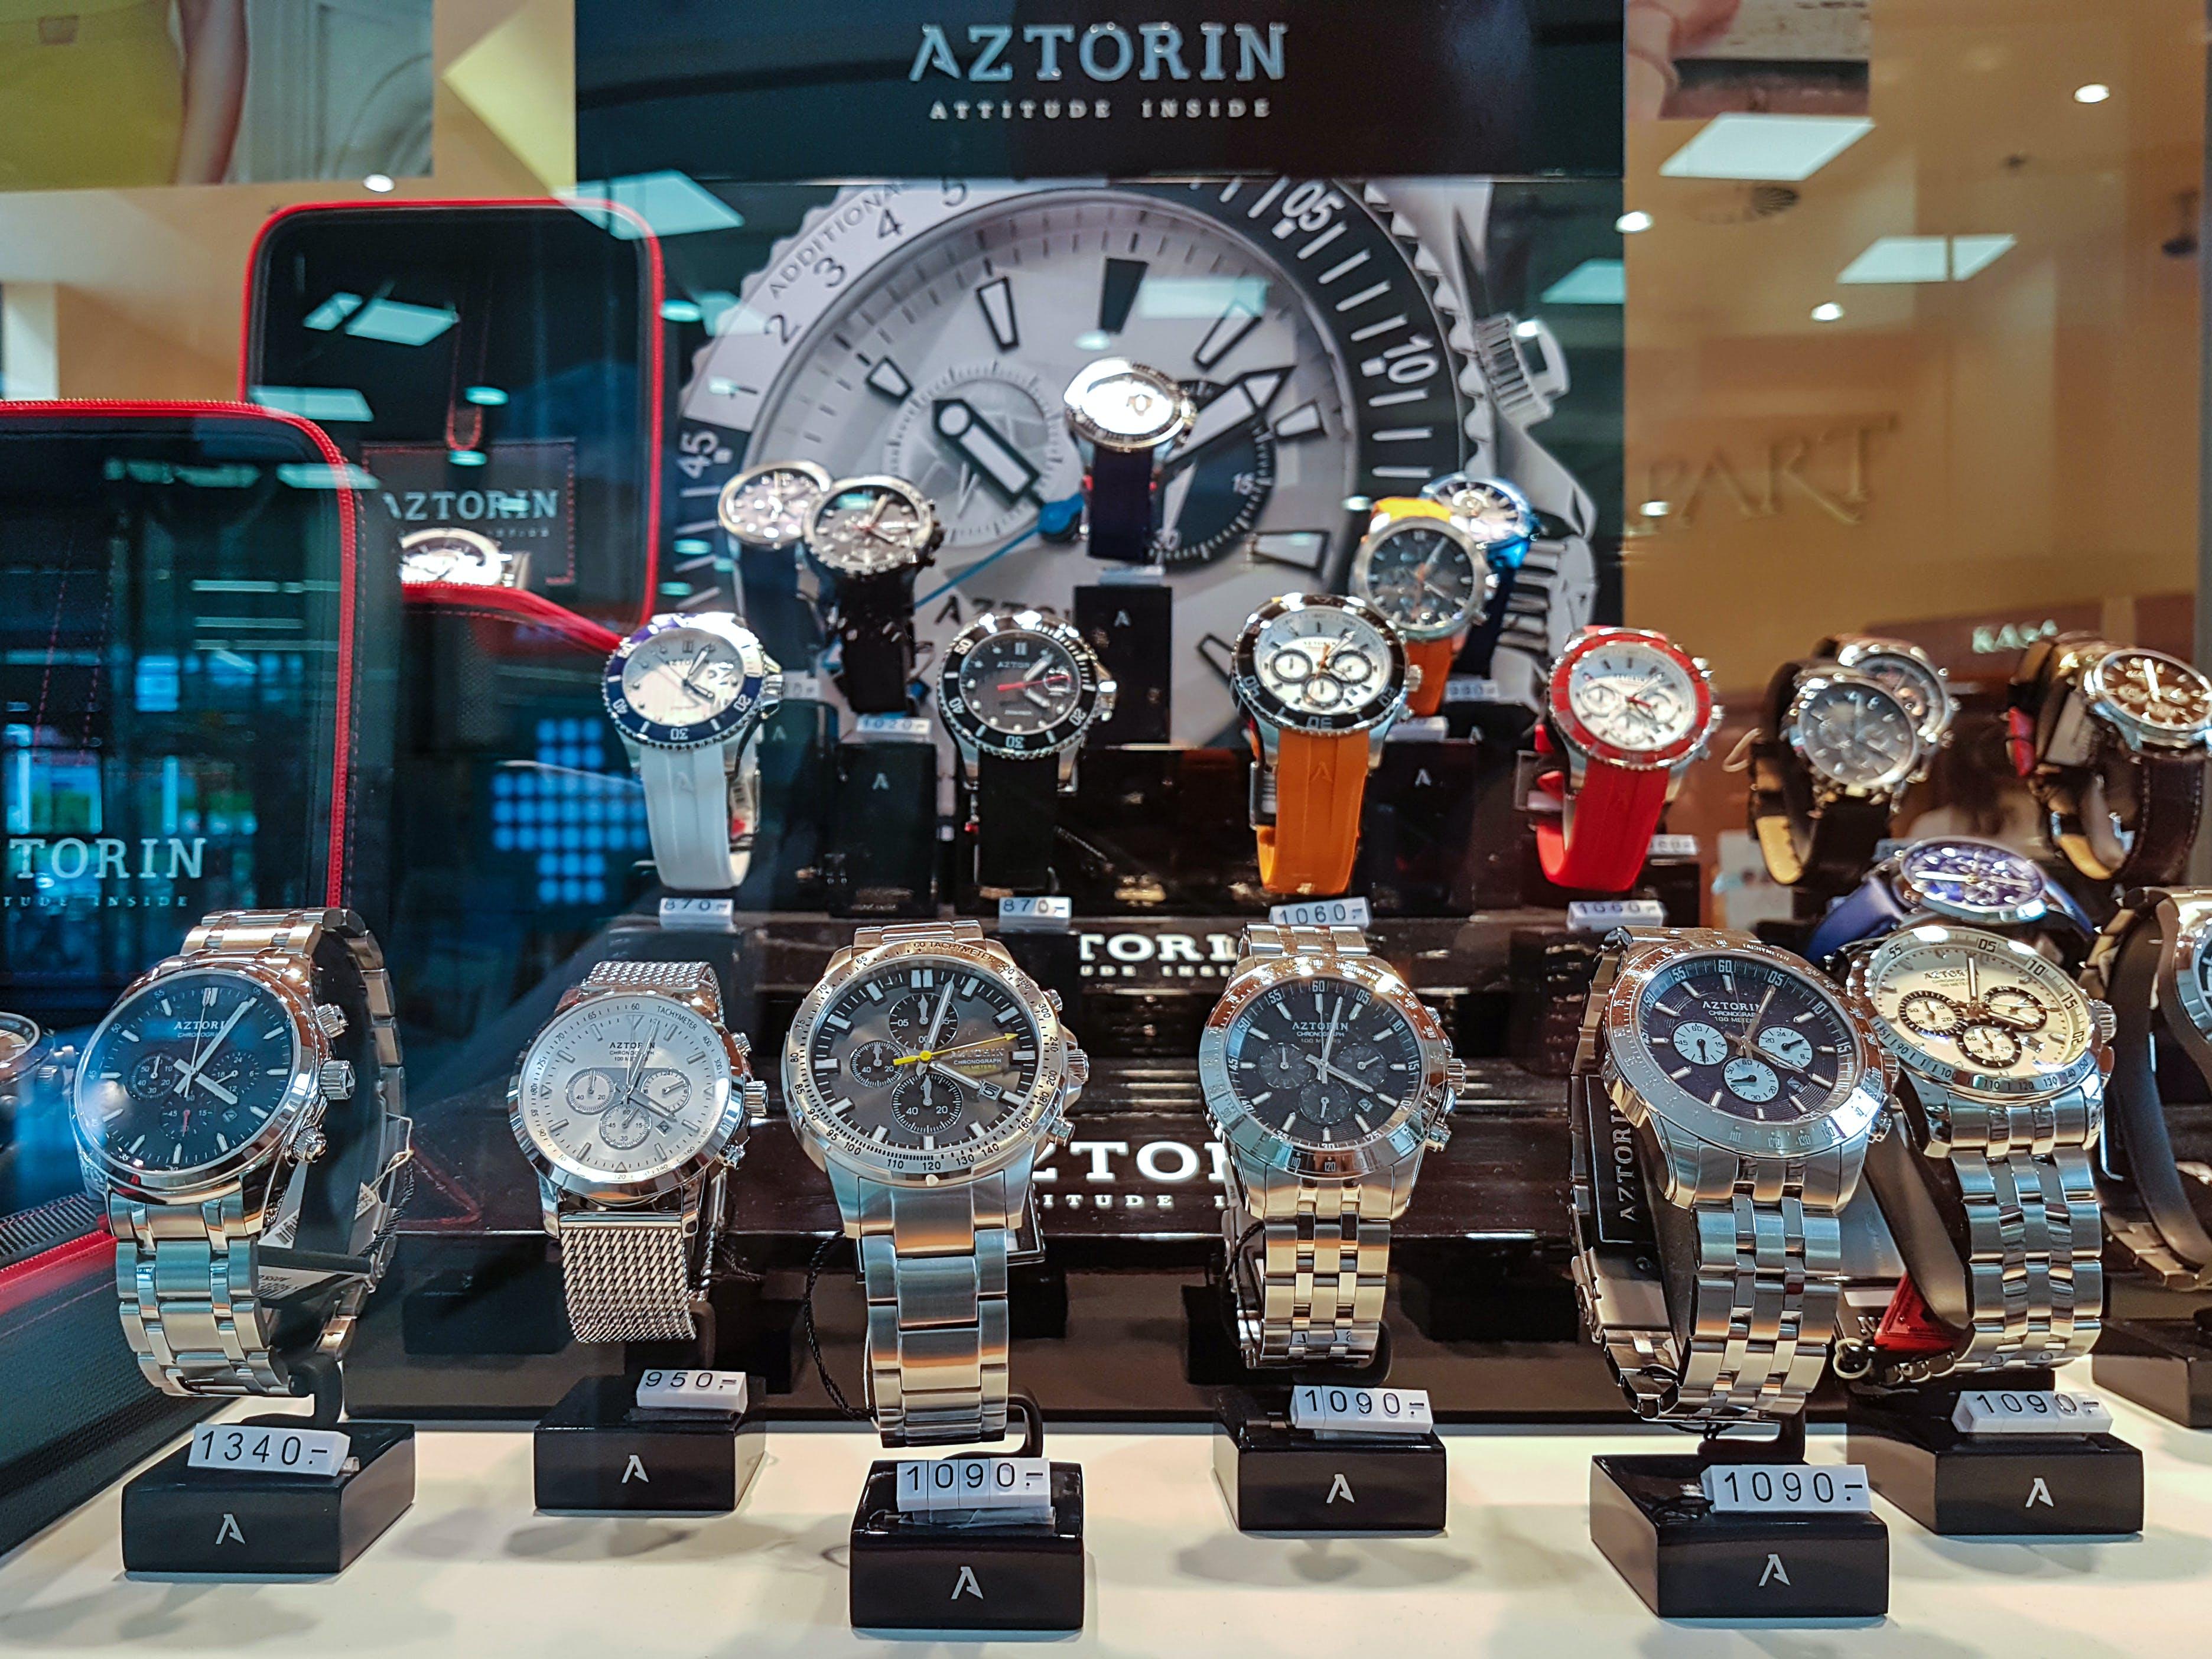 of anniversary, aztorin, boutique Watchmaker, brand